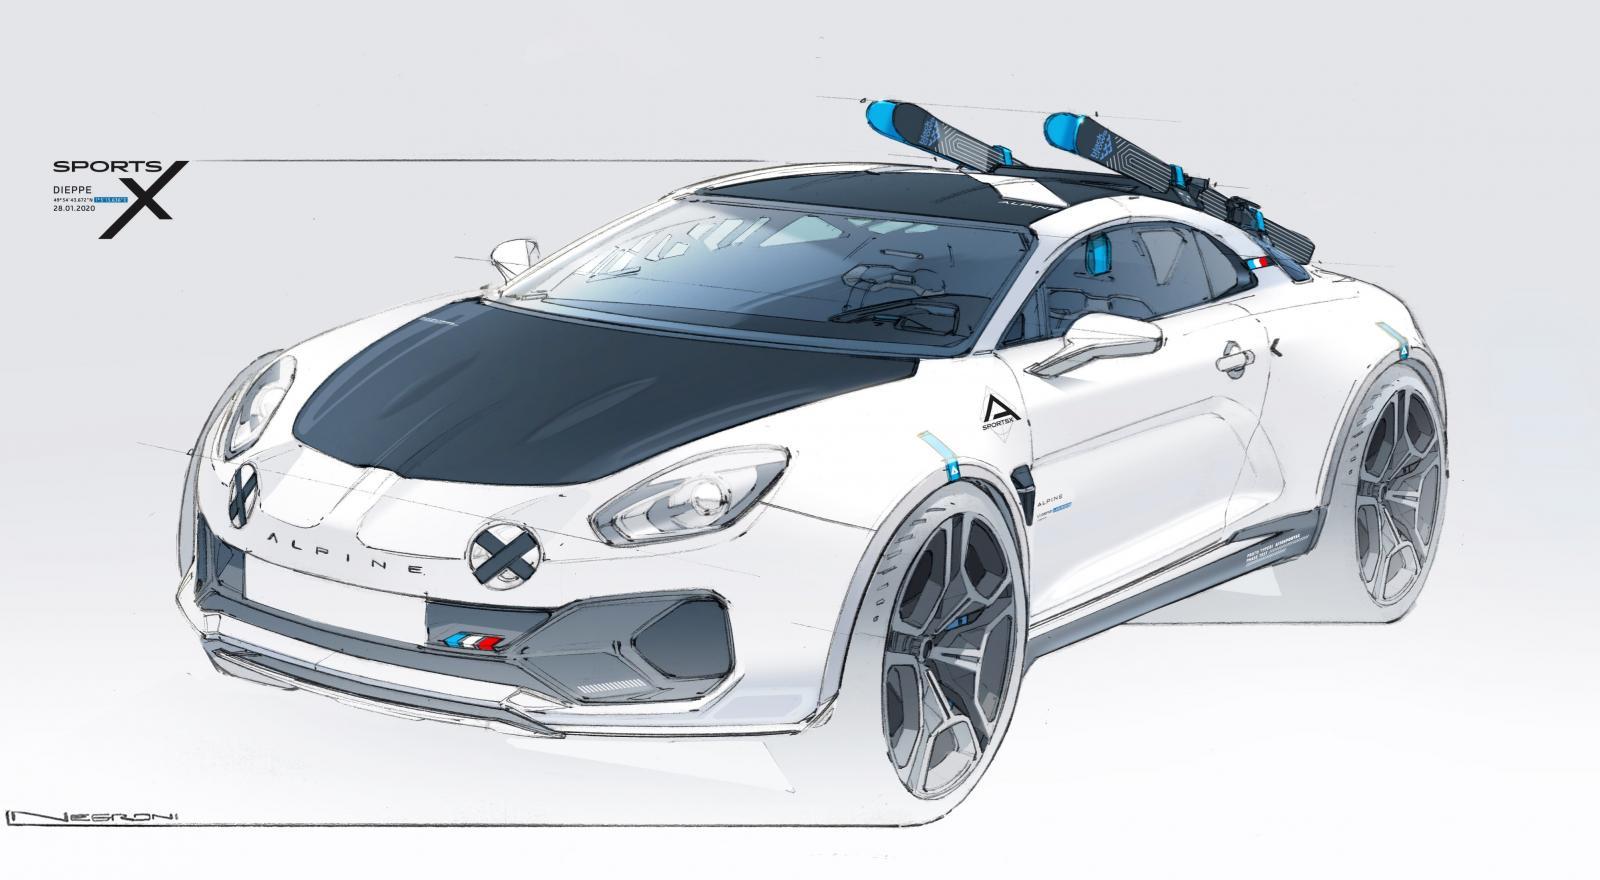 alpine-a110-sportx-concept-car-2